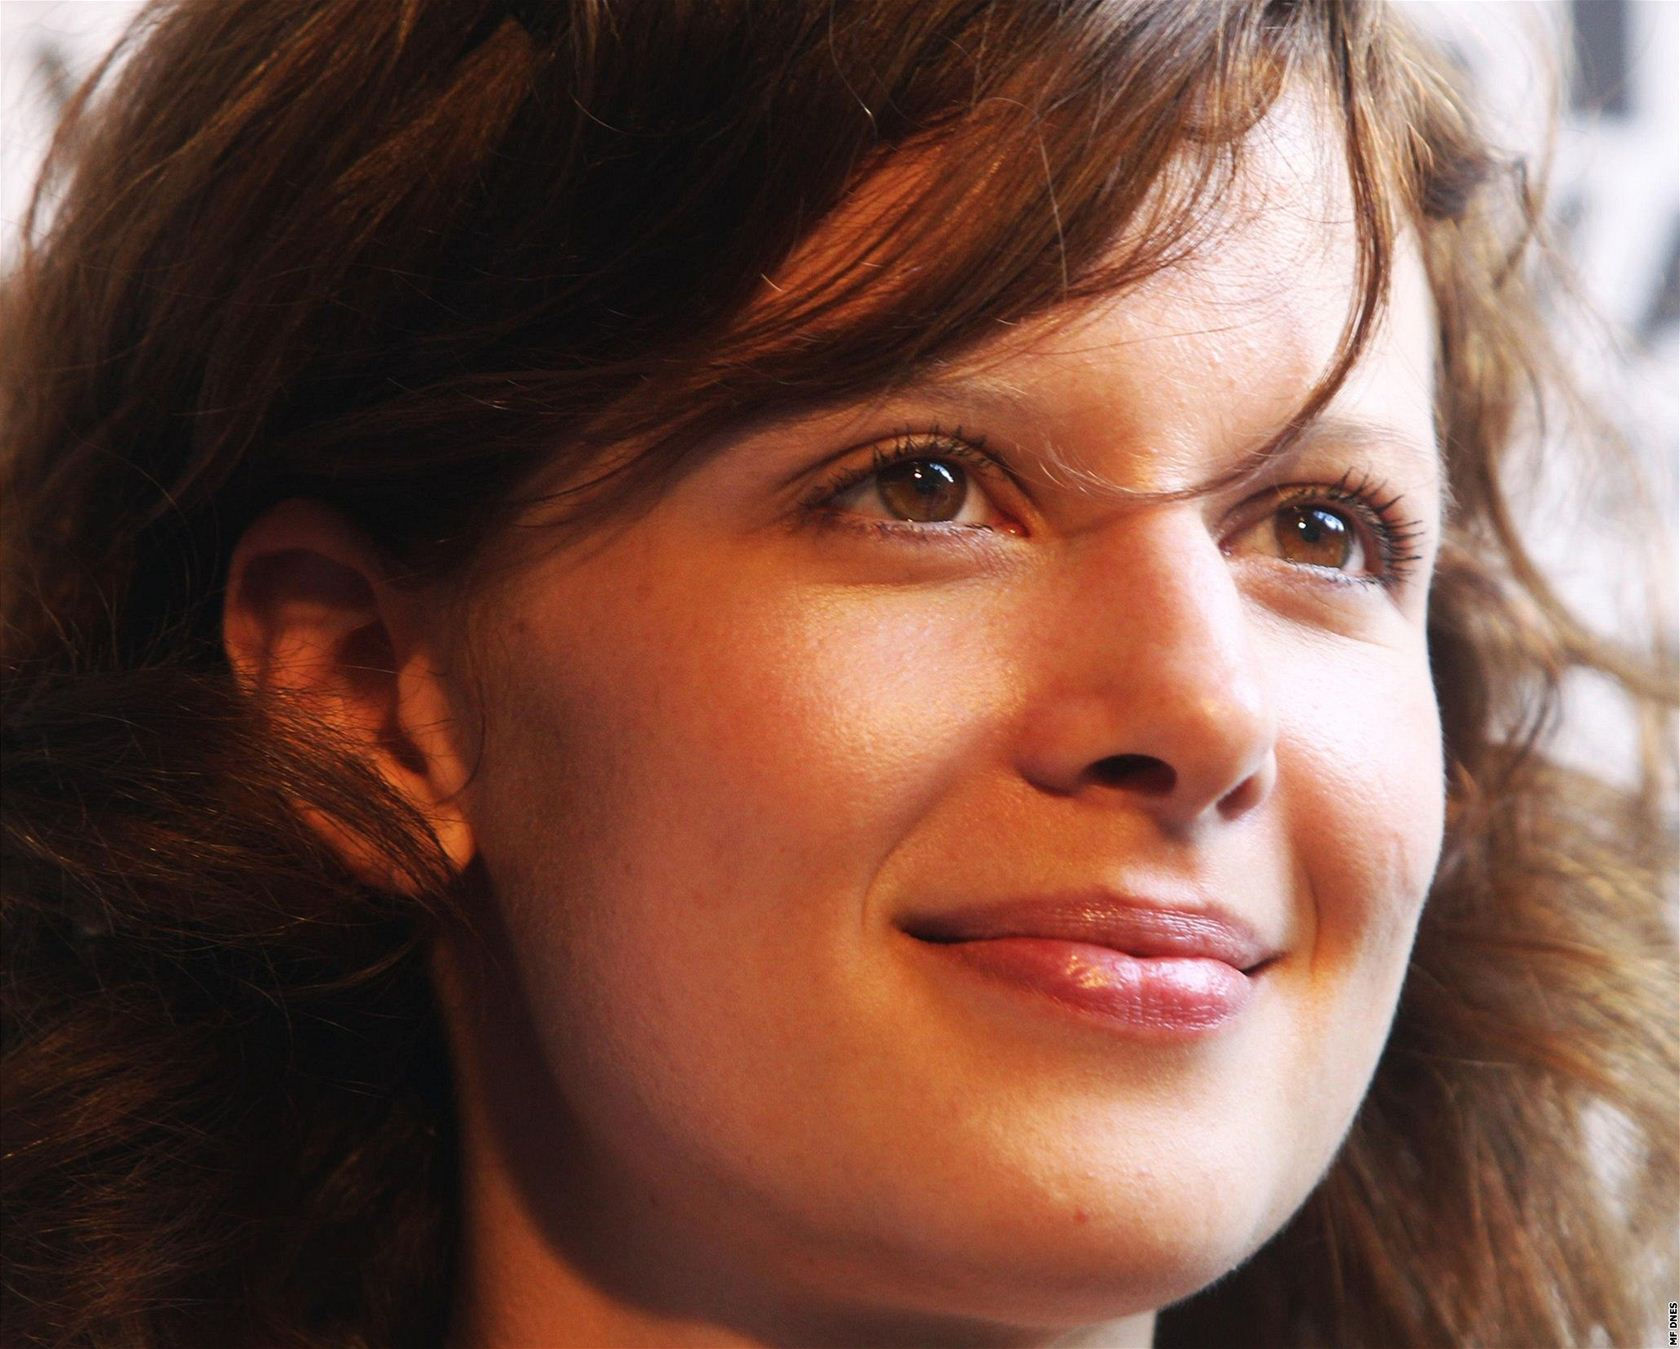 Karolina Gruszka Widescreen for desktop